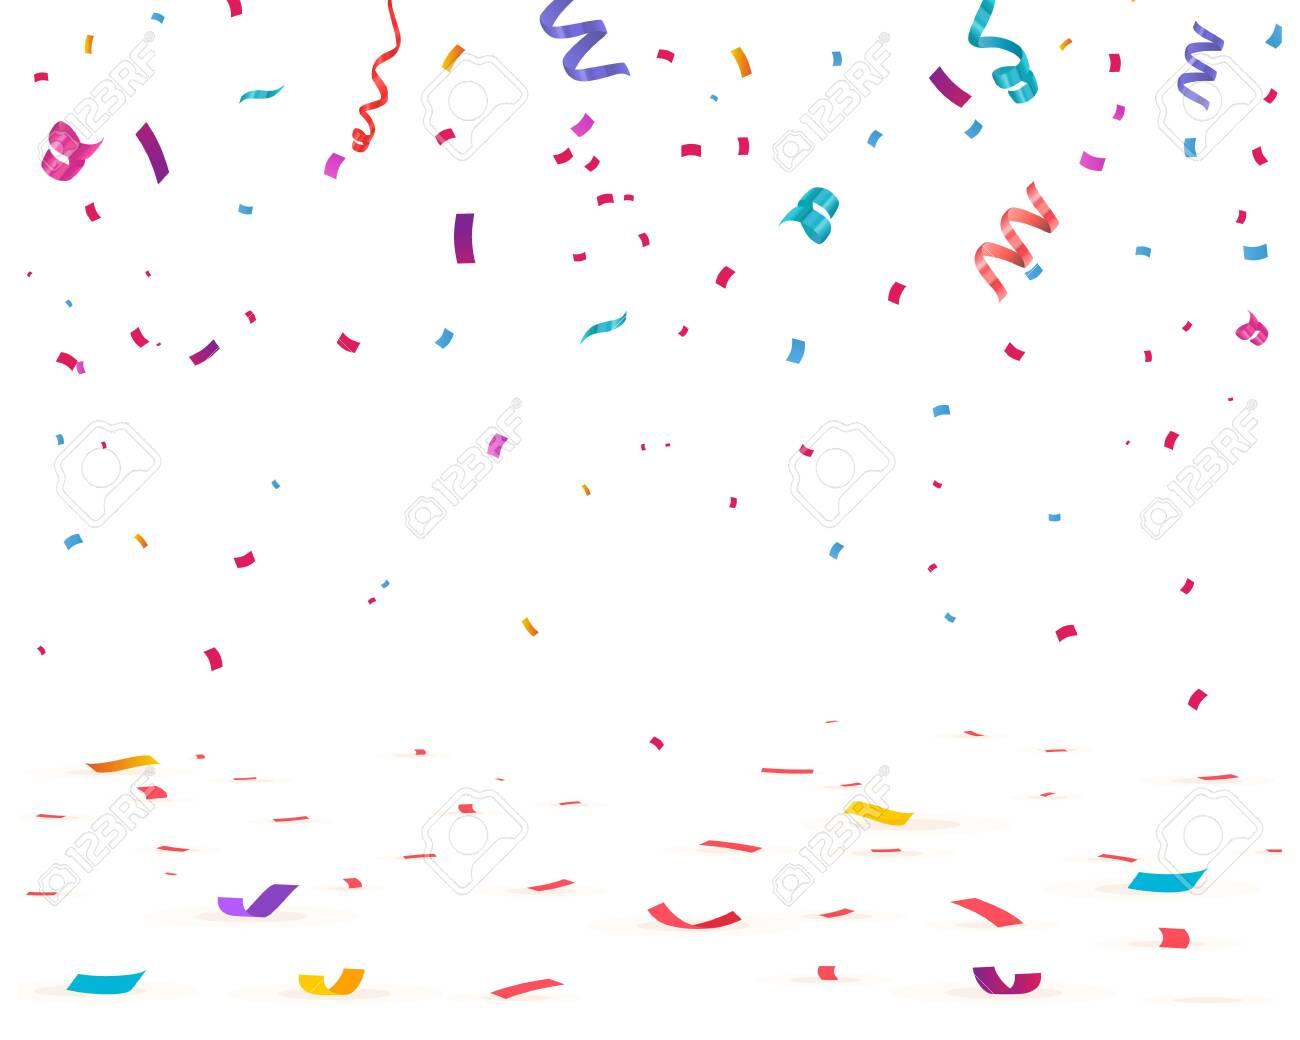 Confetti isolated on white background. Falling confetti, birthday vector illustration - 121740034